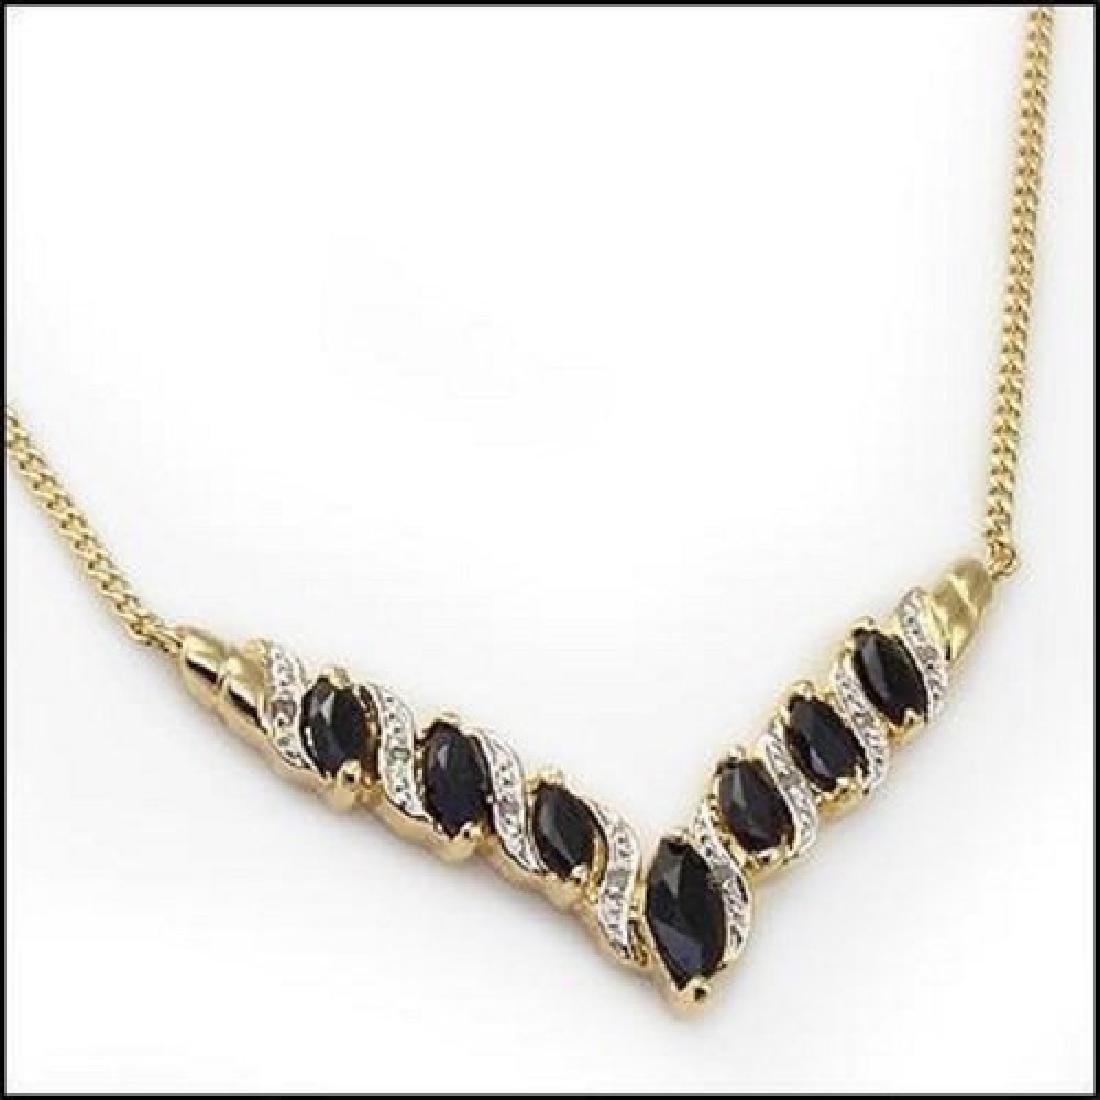 6.92 CT Sapphire & Diamond Designer Necklace MSRP $1120